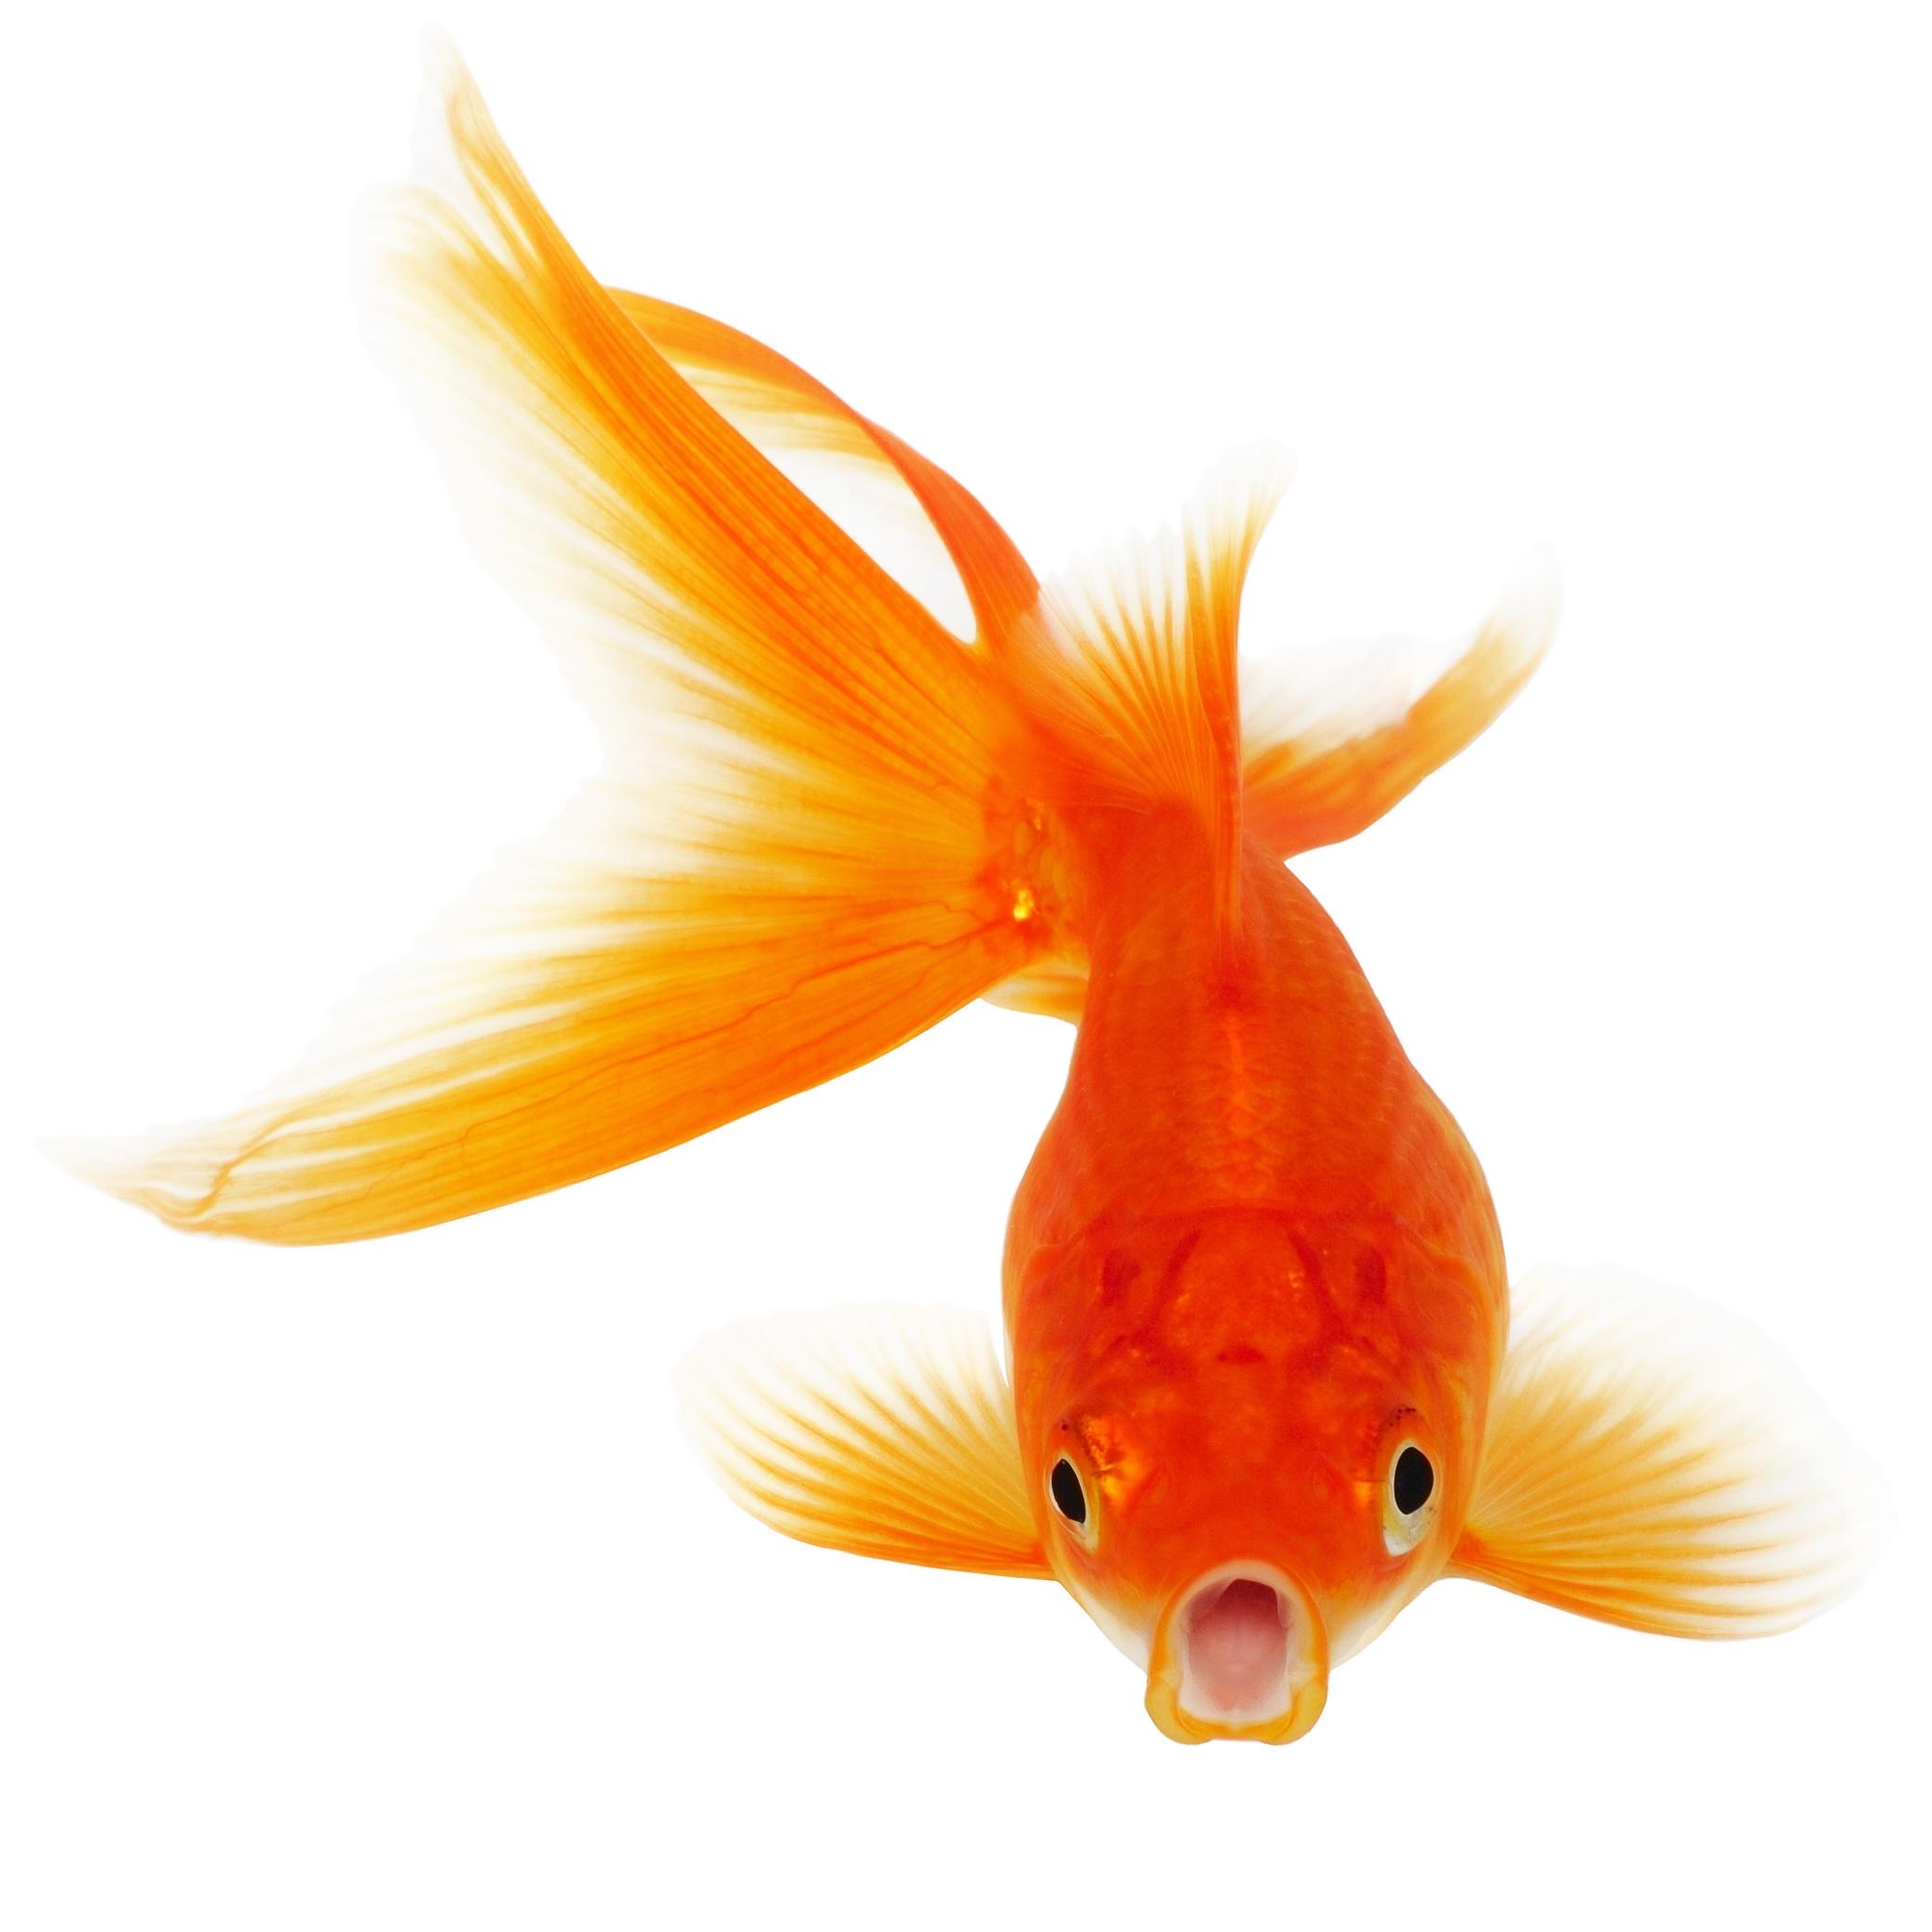 Goldfish PNG HD - 124064